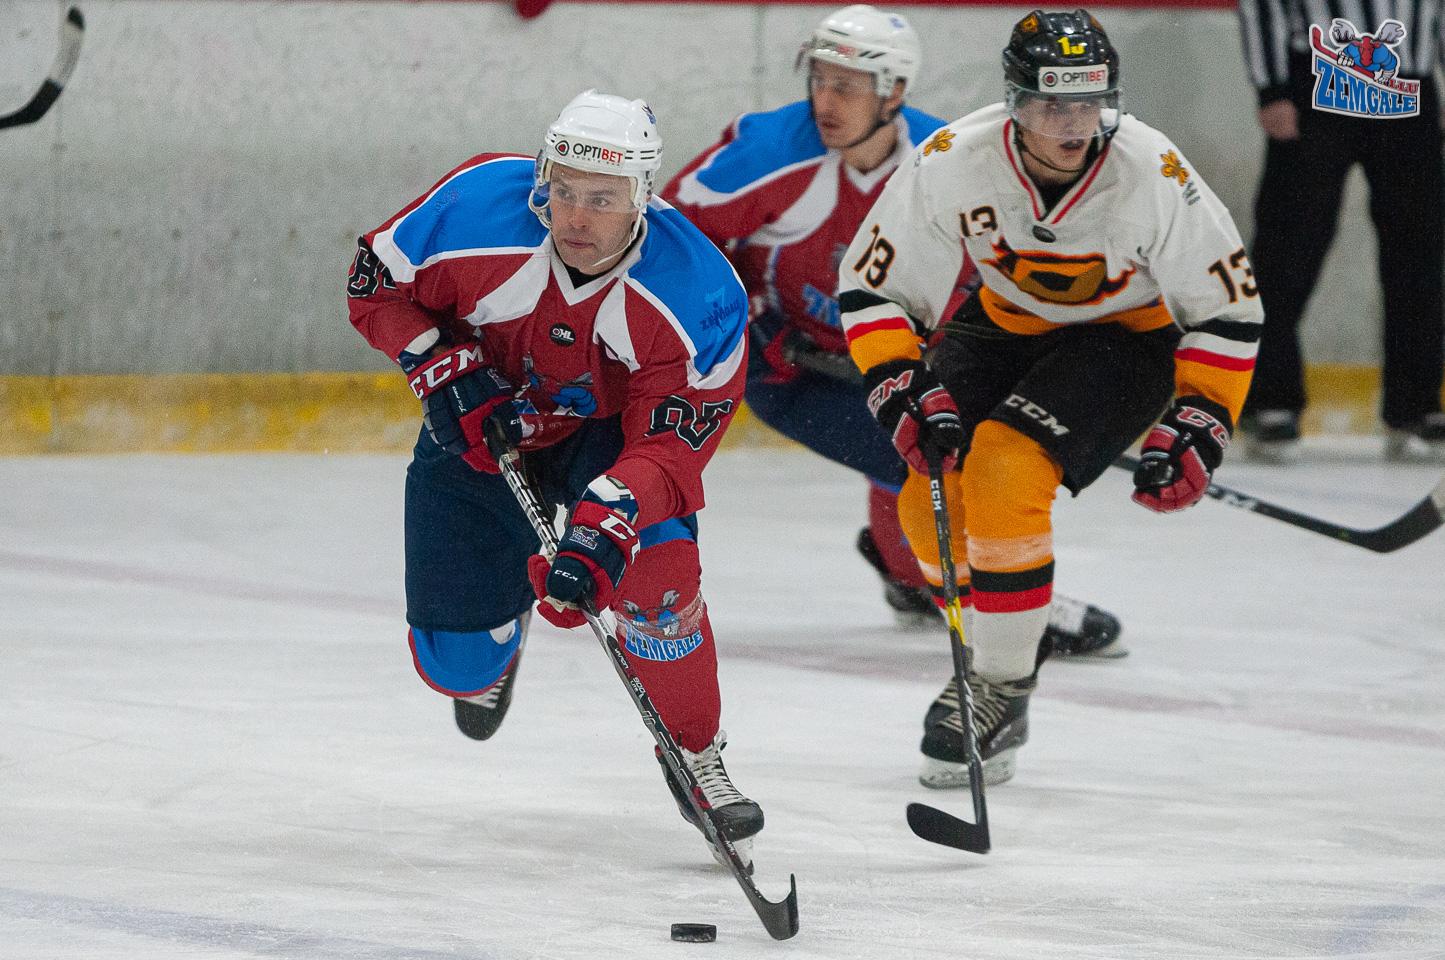 Hokejists ar ripu raujas pretuzbrukumā